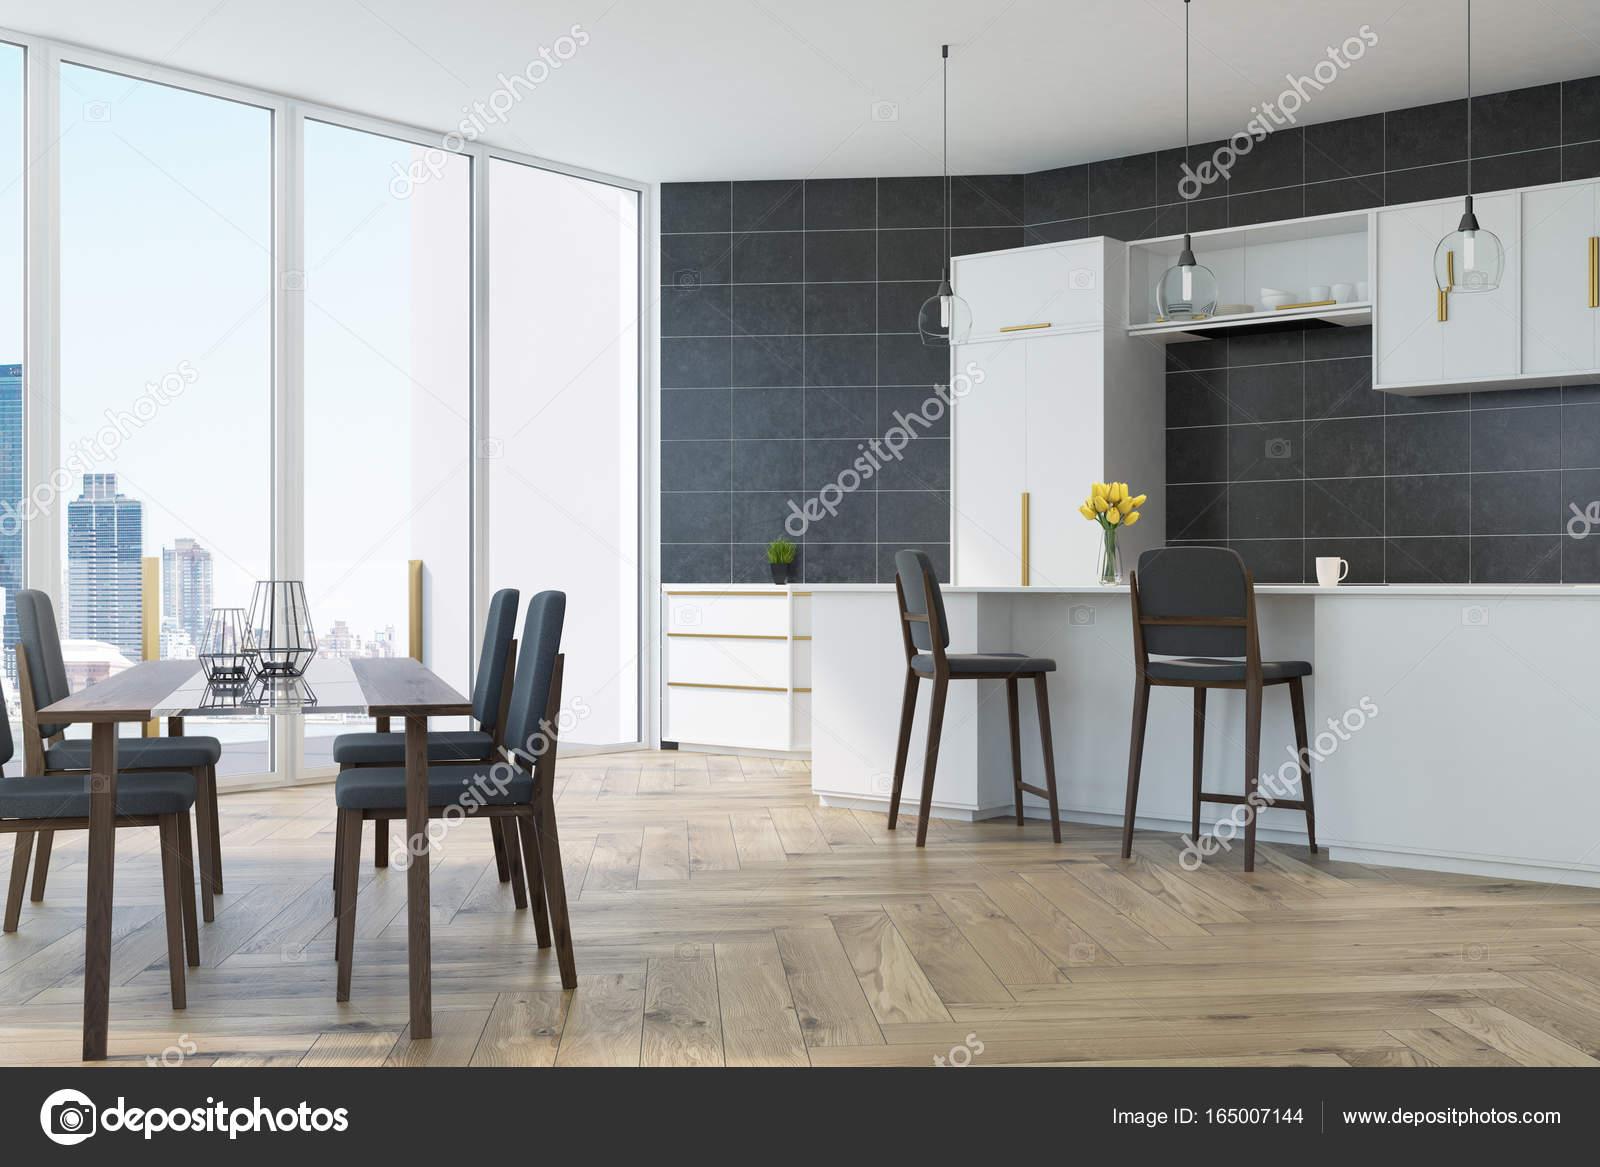 Cucina grigia con una tabella u foto stock denisismagilov